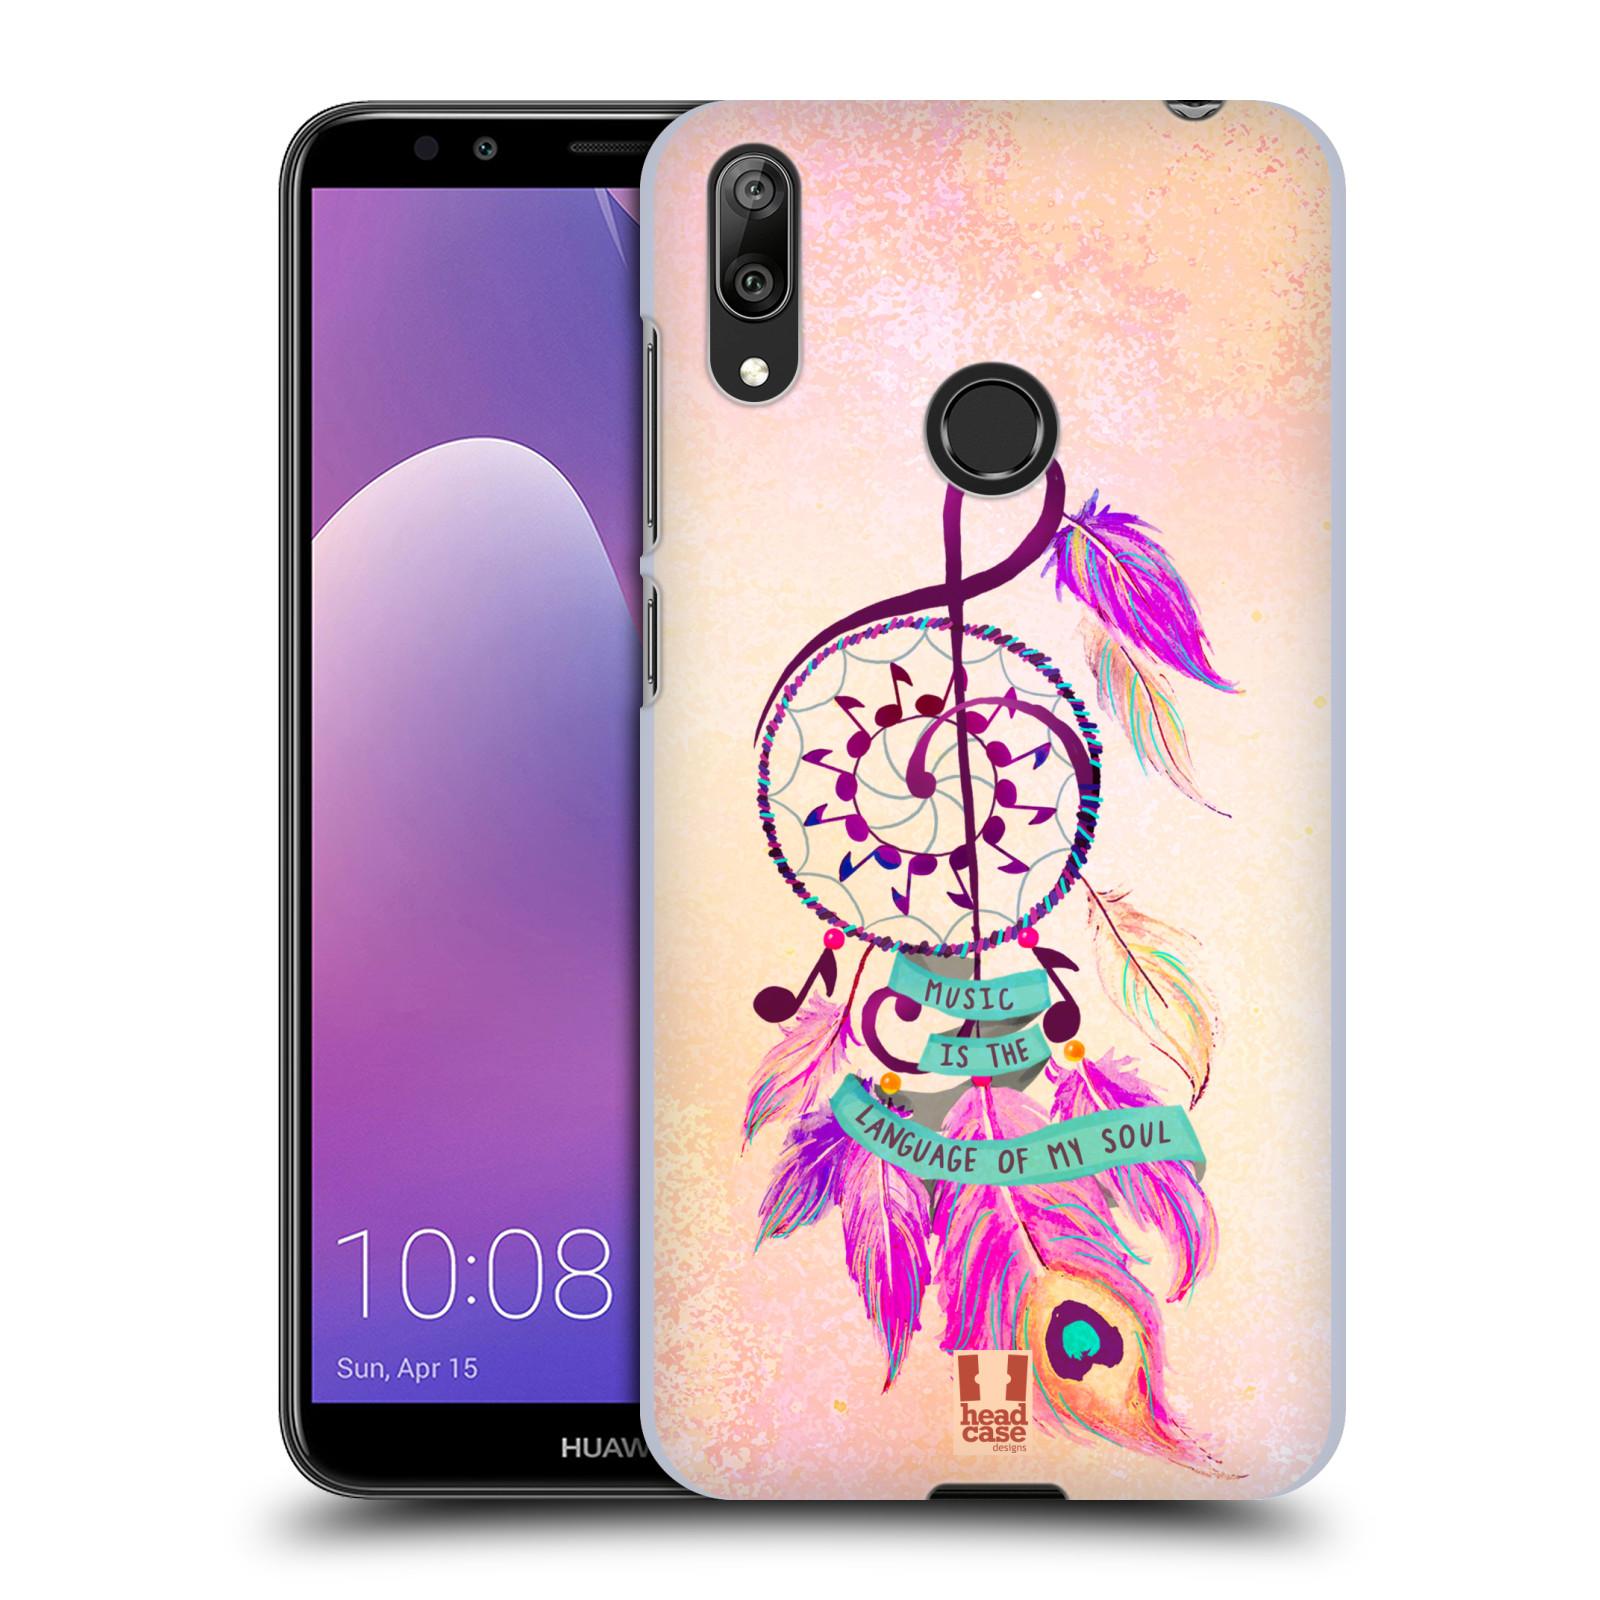 Plastové pouzdro na mobil Huawei Y7 (2019) - Head Case - Lapač Assorted Music